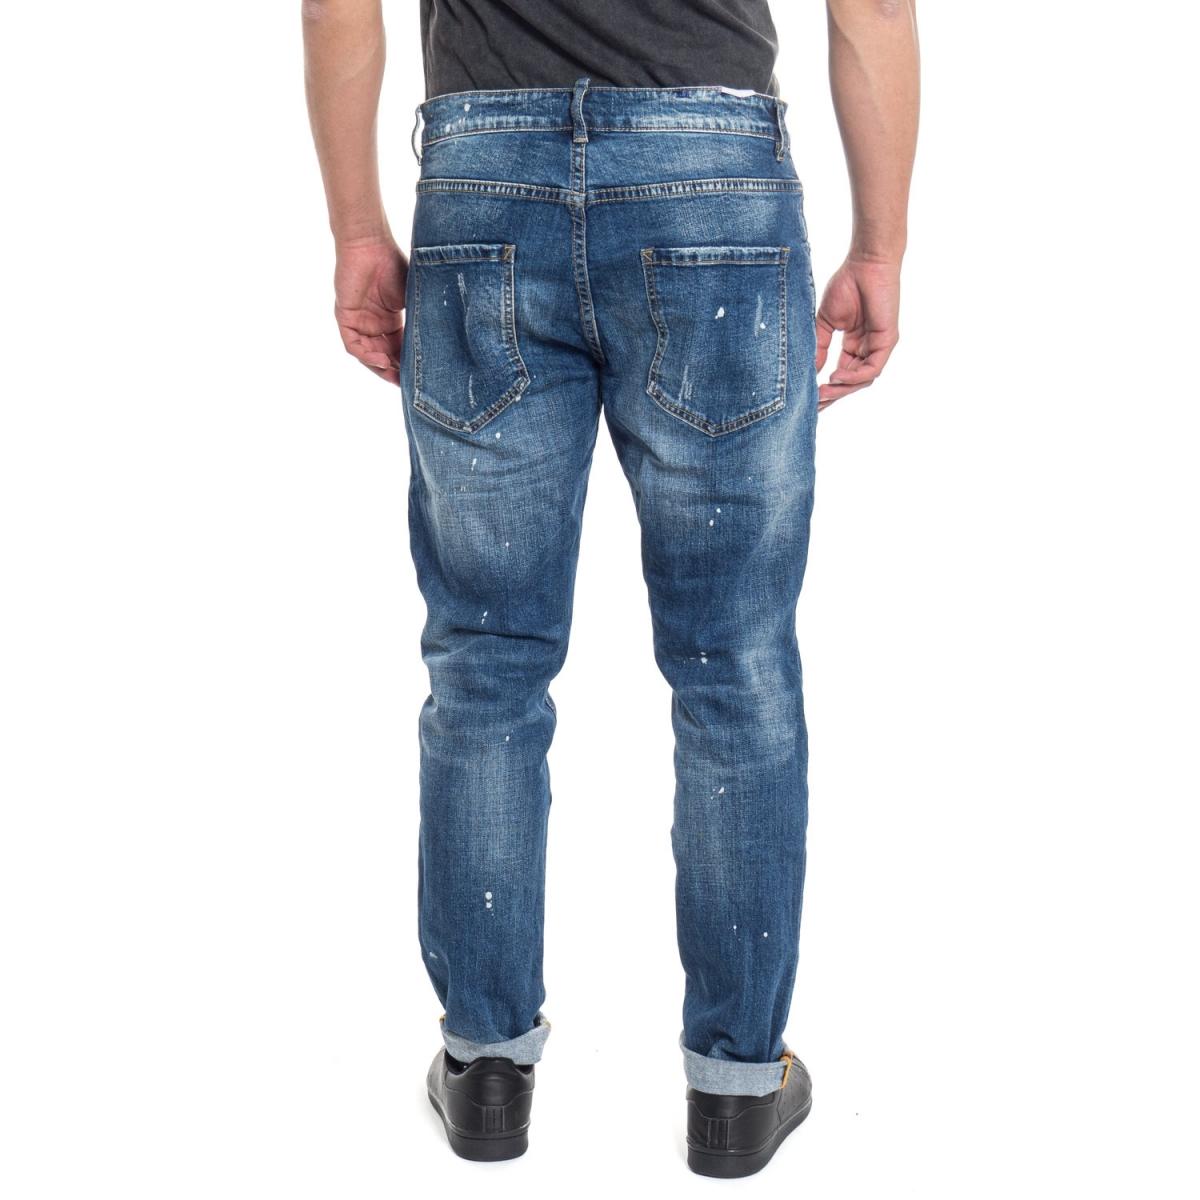 abbigliamento Jeans uomo Jeans Slim Fit LPY1798 LANDEK PARK Cafedelmar Shop